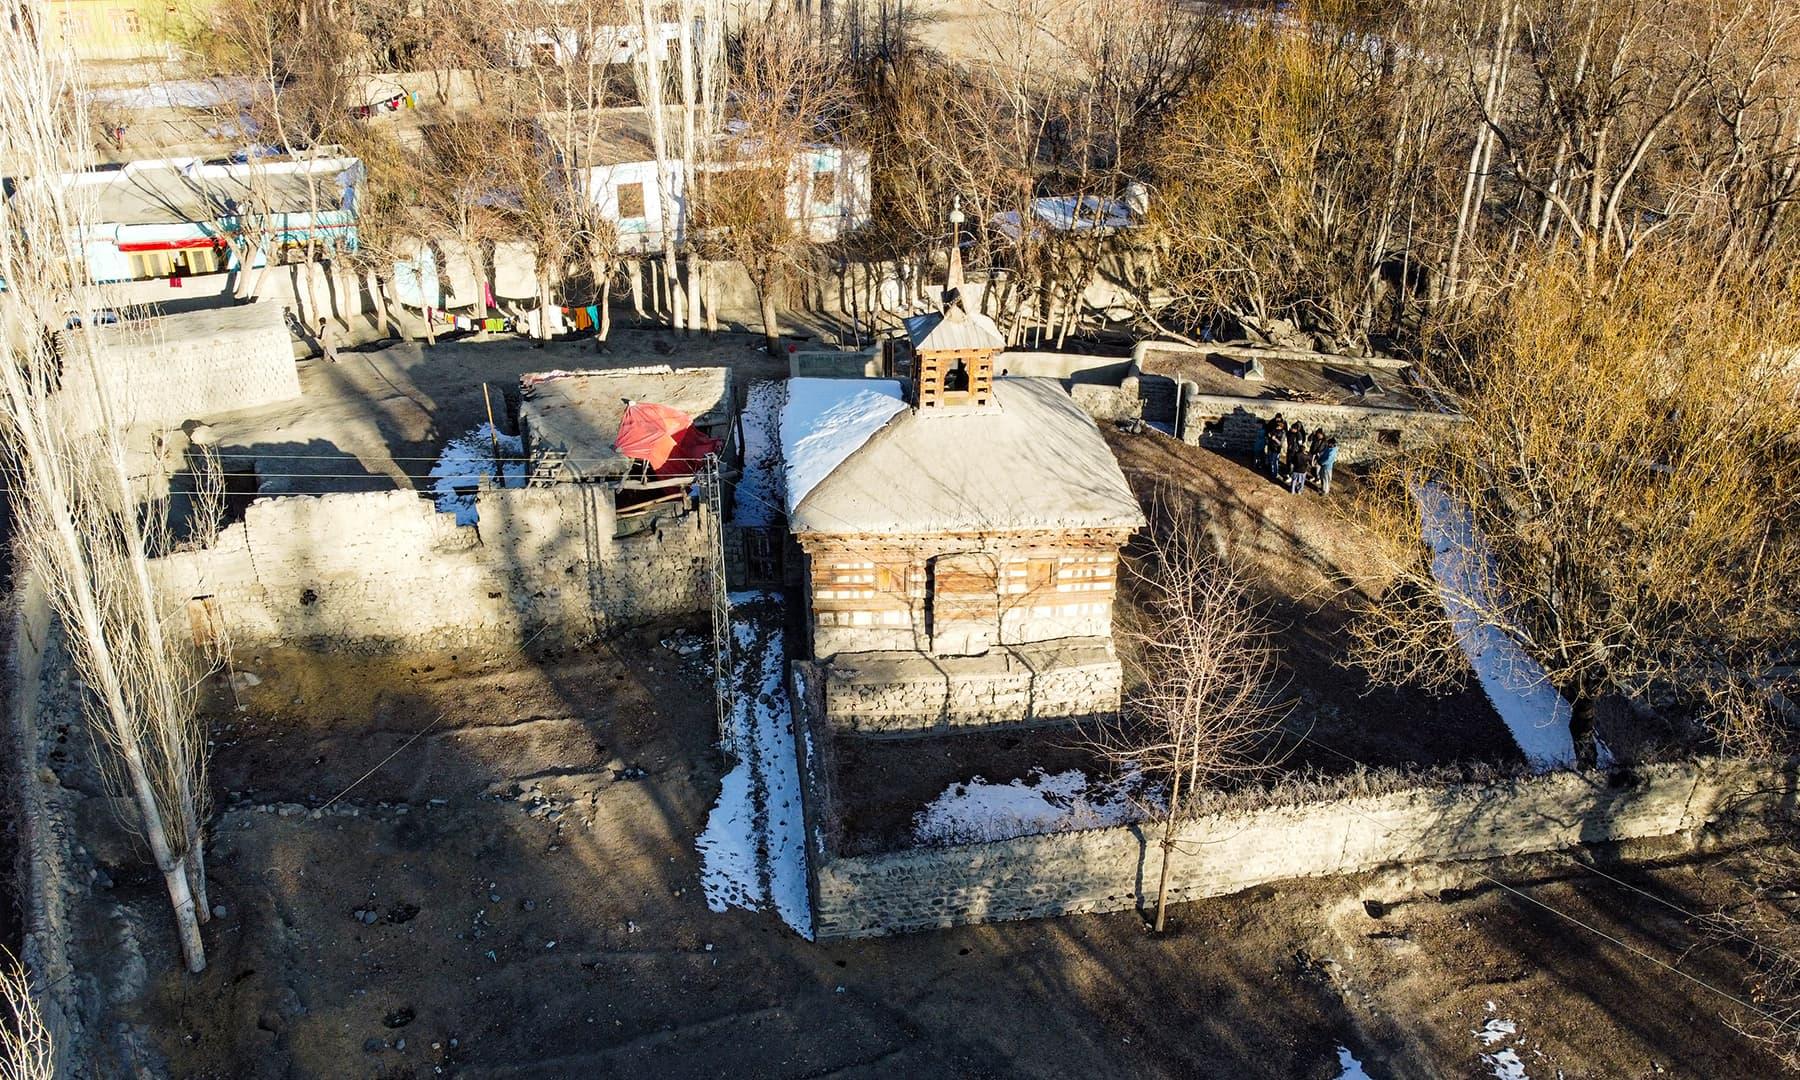 شگر شہر میں واقع 700 سالہ قدیم مسجد